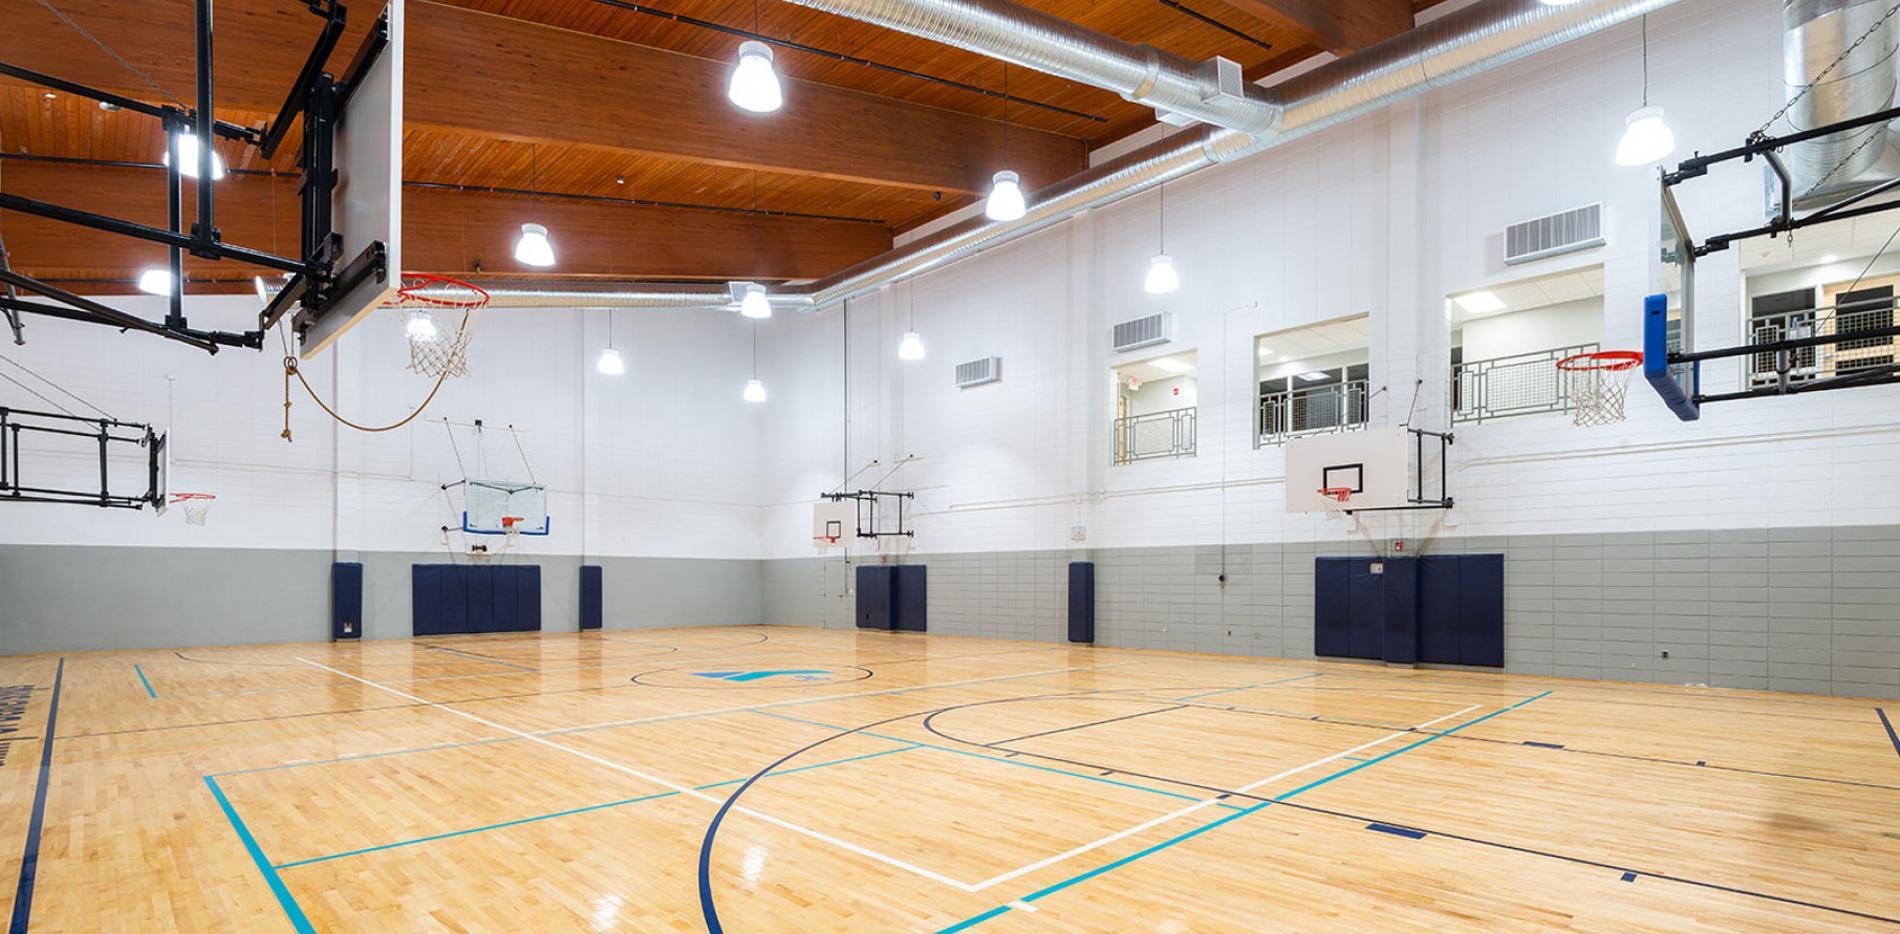 Ocean Community YMCA basketball court